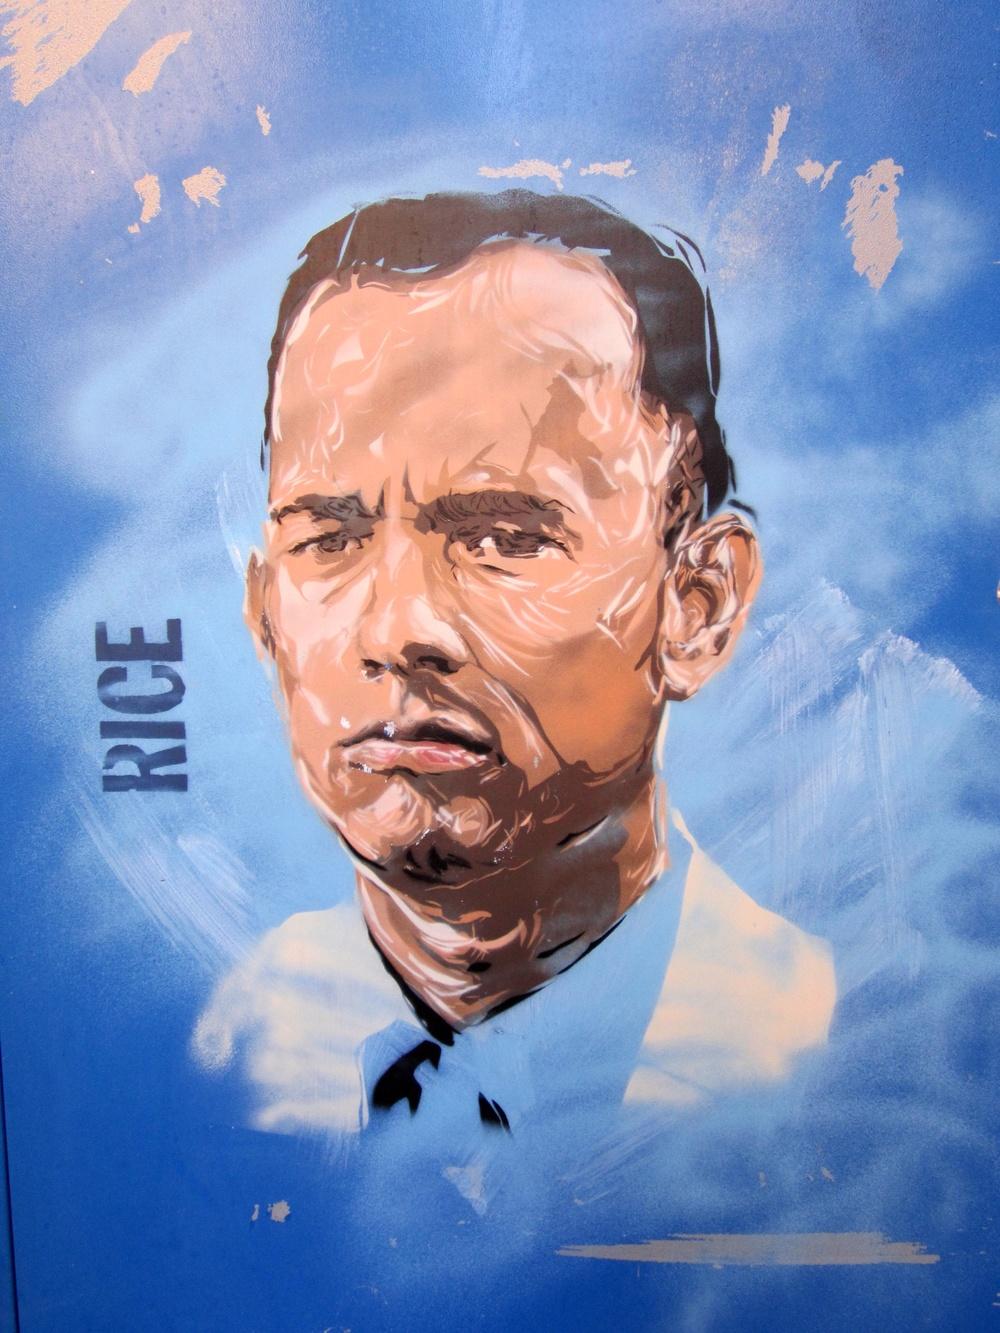 RICE Tom Hanks in London Shoreditch